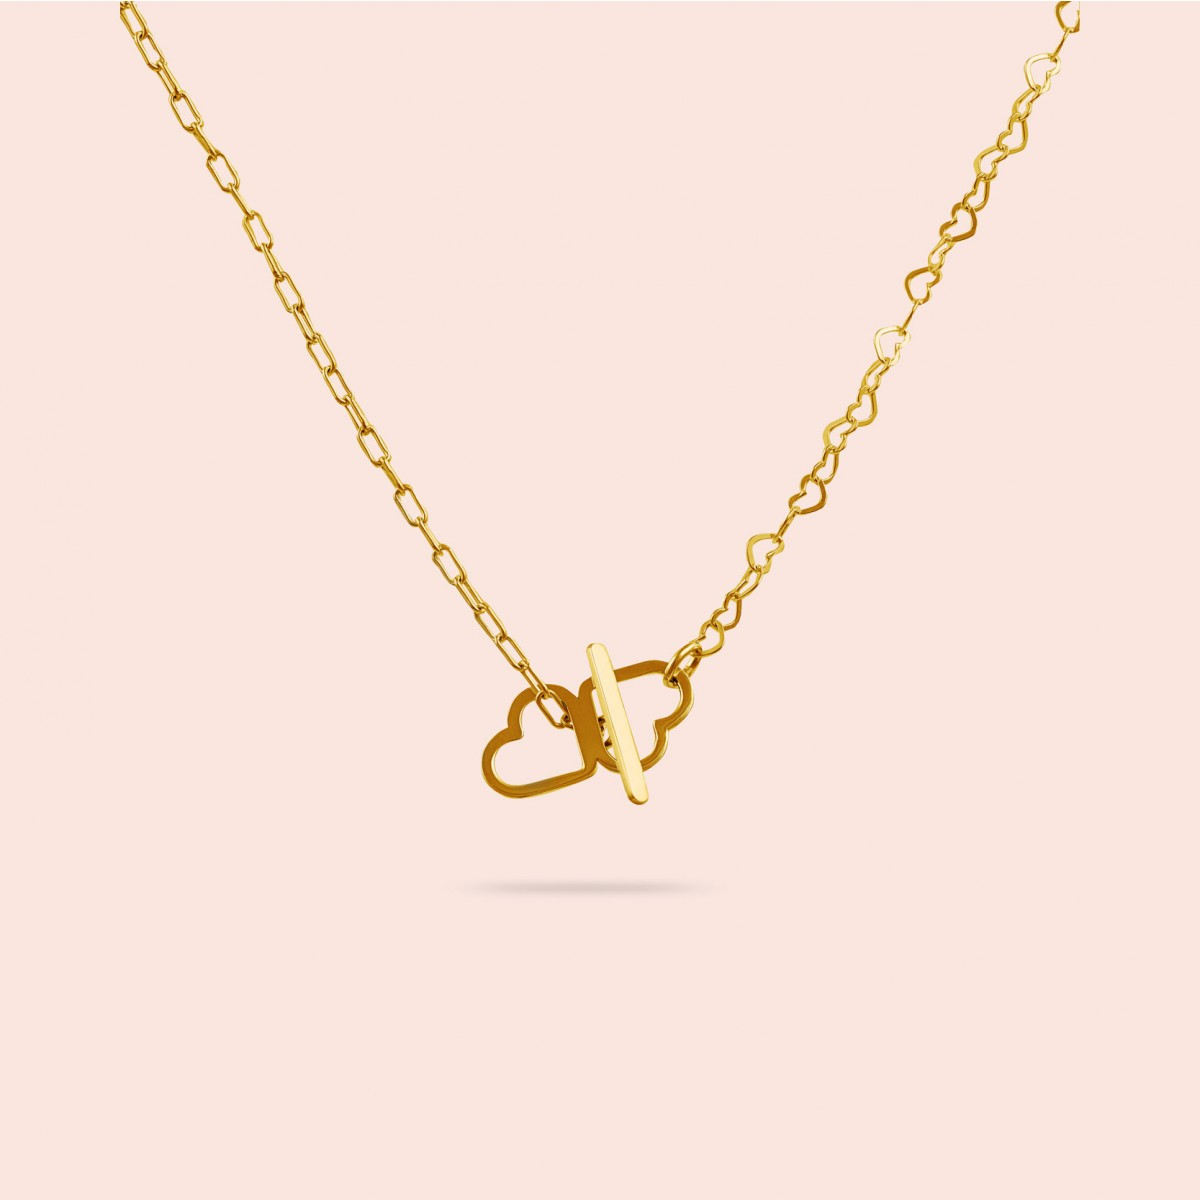 just hearts extended necklace - 925 Sterlingsilber 18k goldplattiert